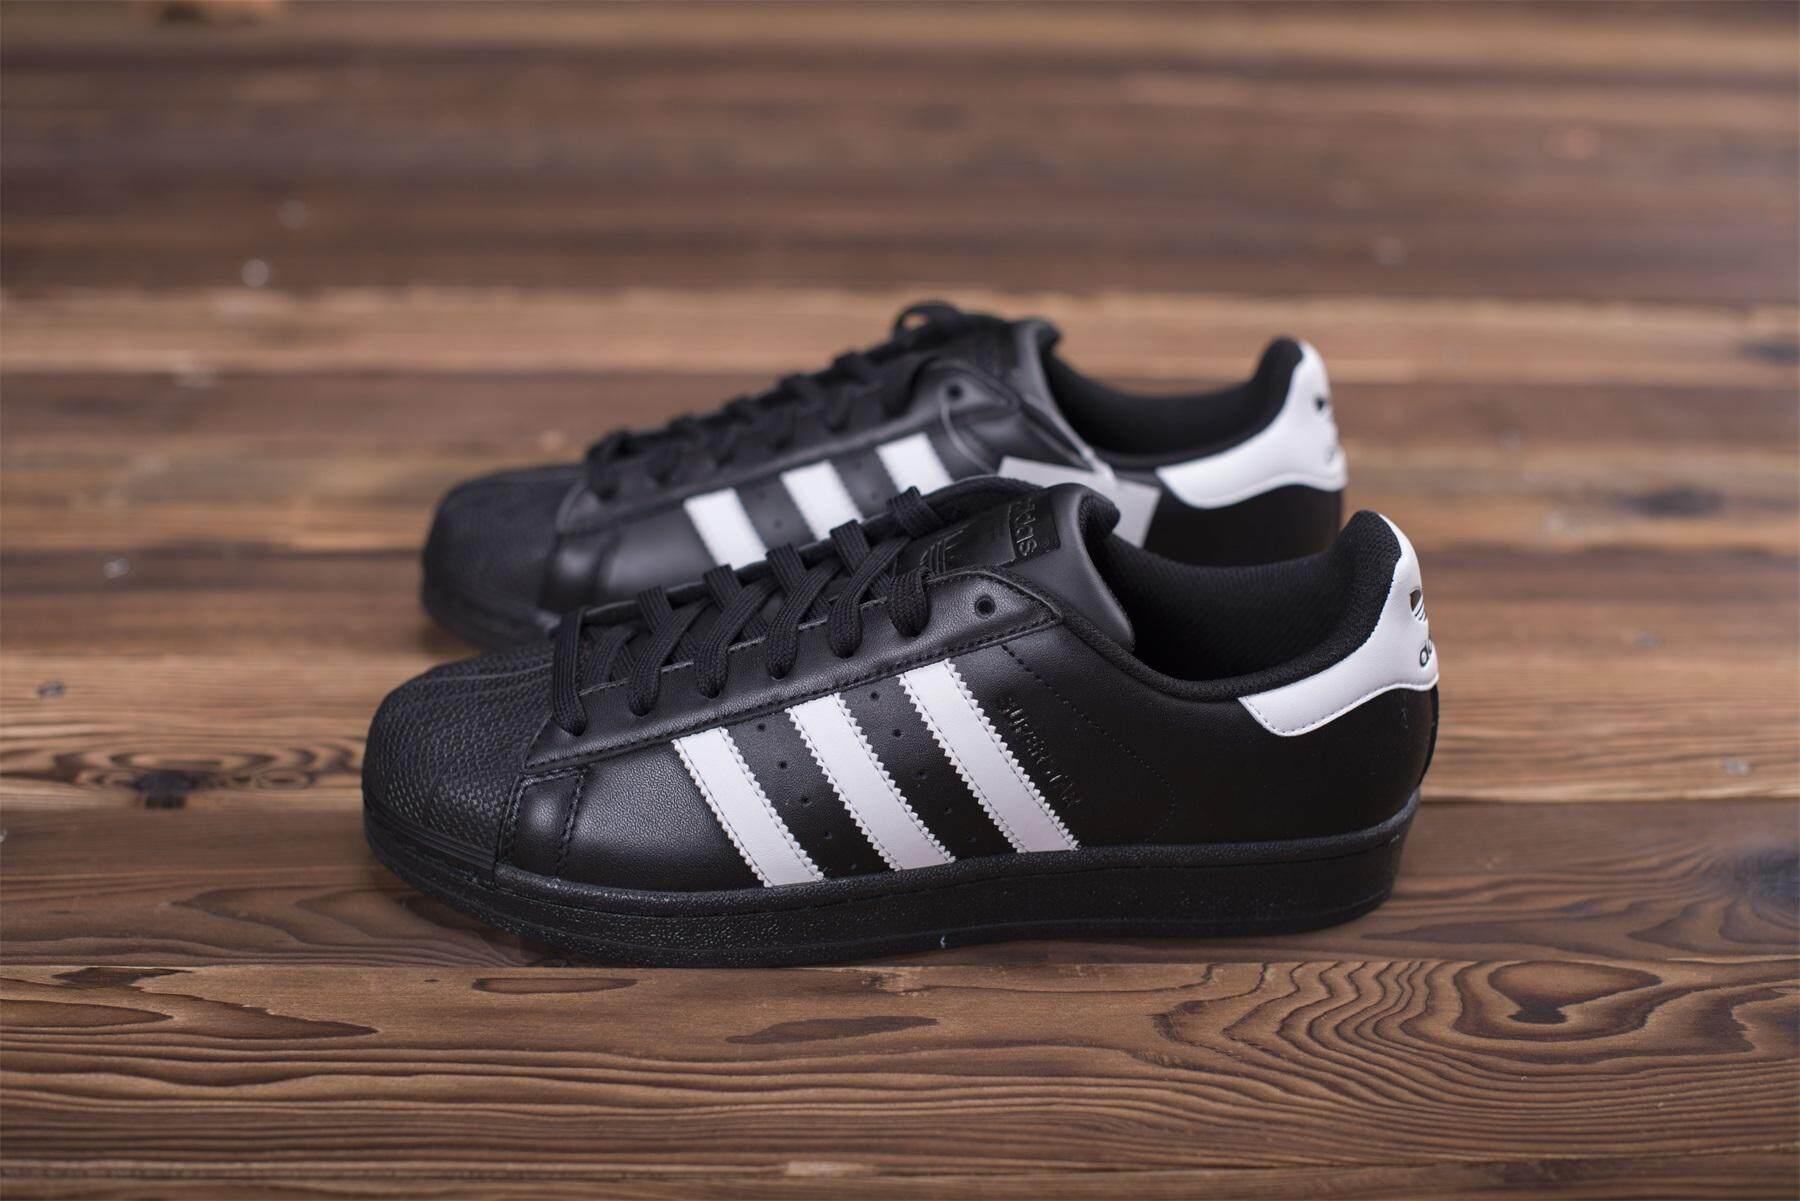 Adidas Products Accessories At Best Price In Malaysia Lazada Ultra Boost Kids  Sepatu Anak Olahraga Import Premium